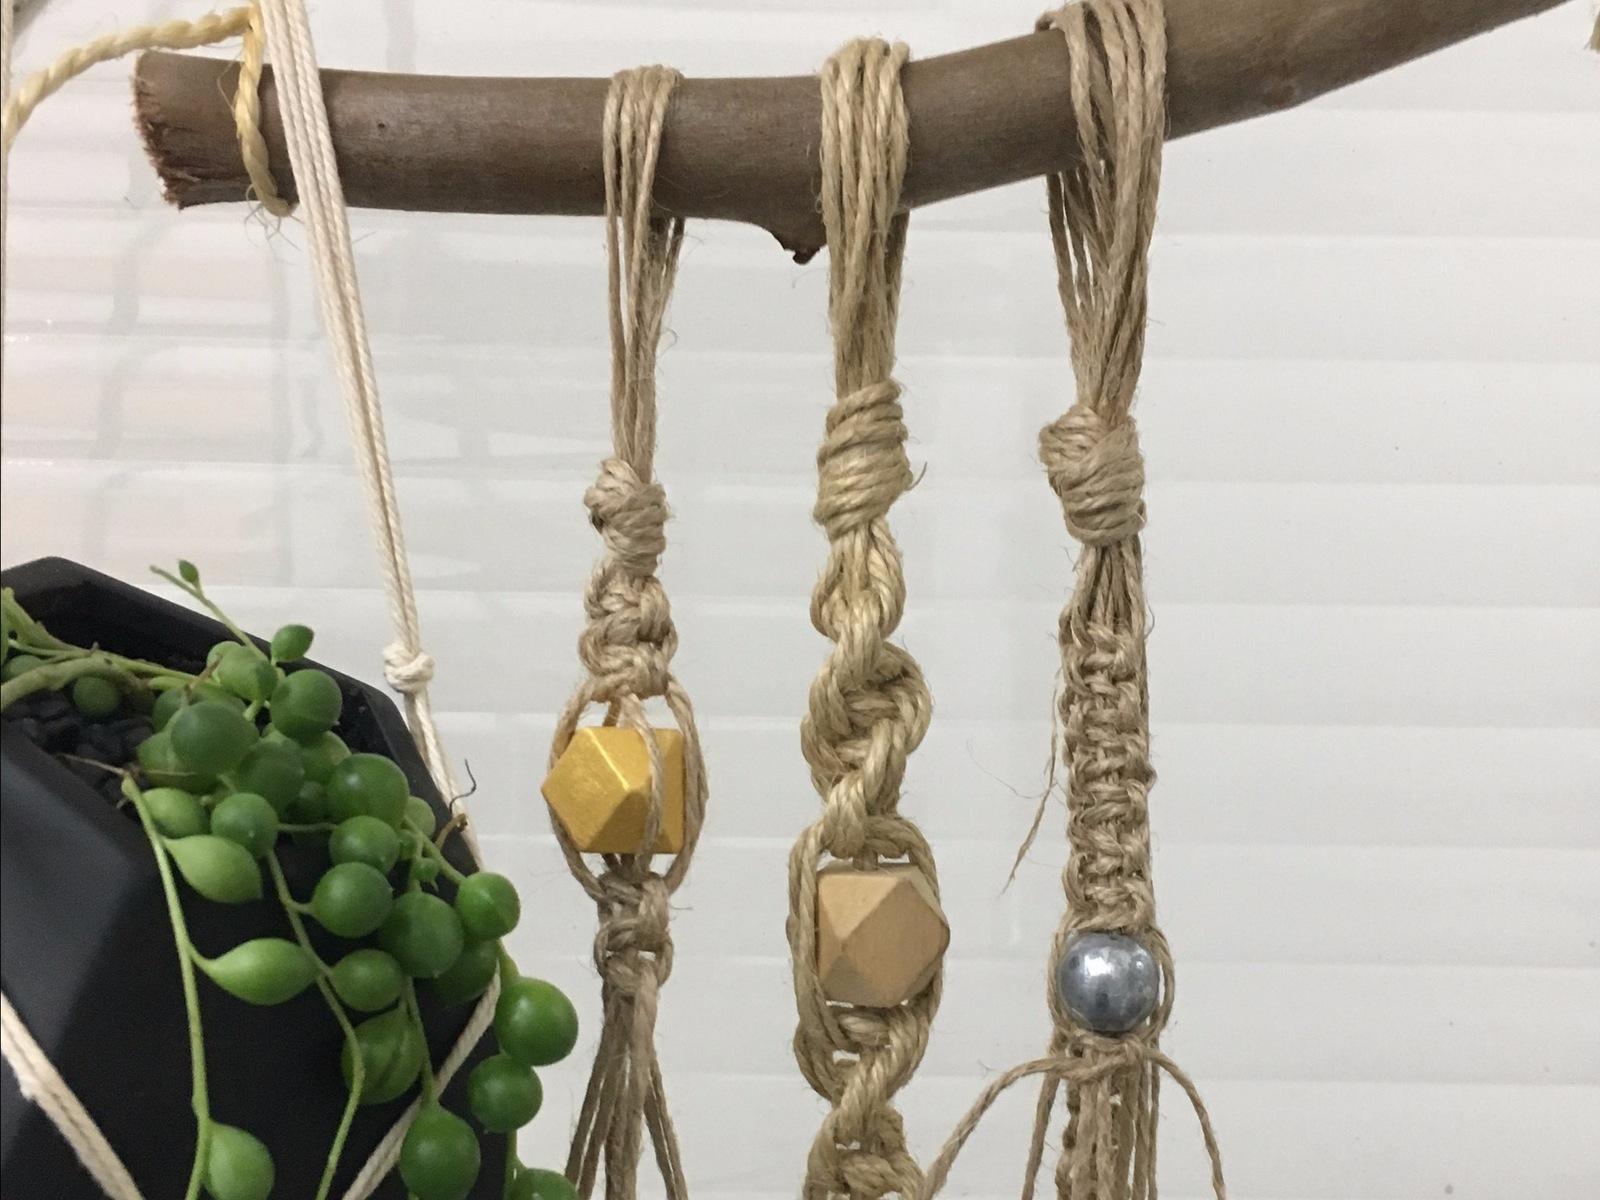 Beechworth Lost Arts Series - Make a Macrame Plant Holder